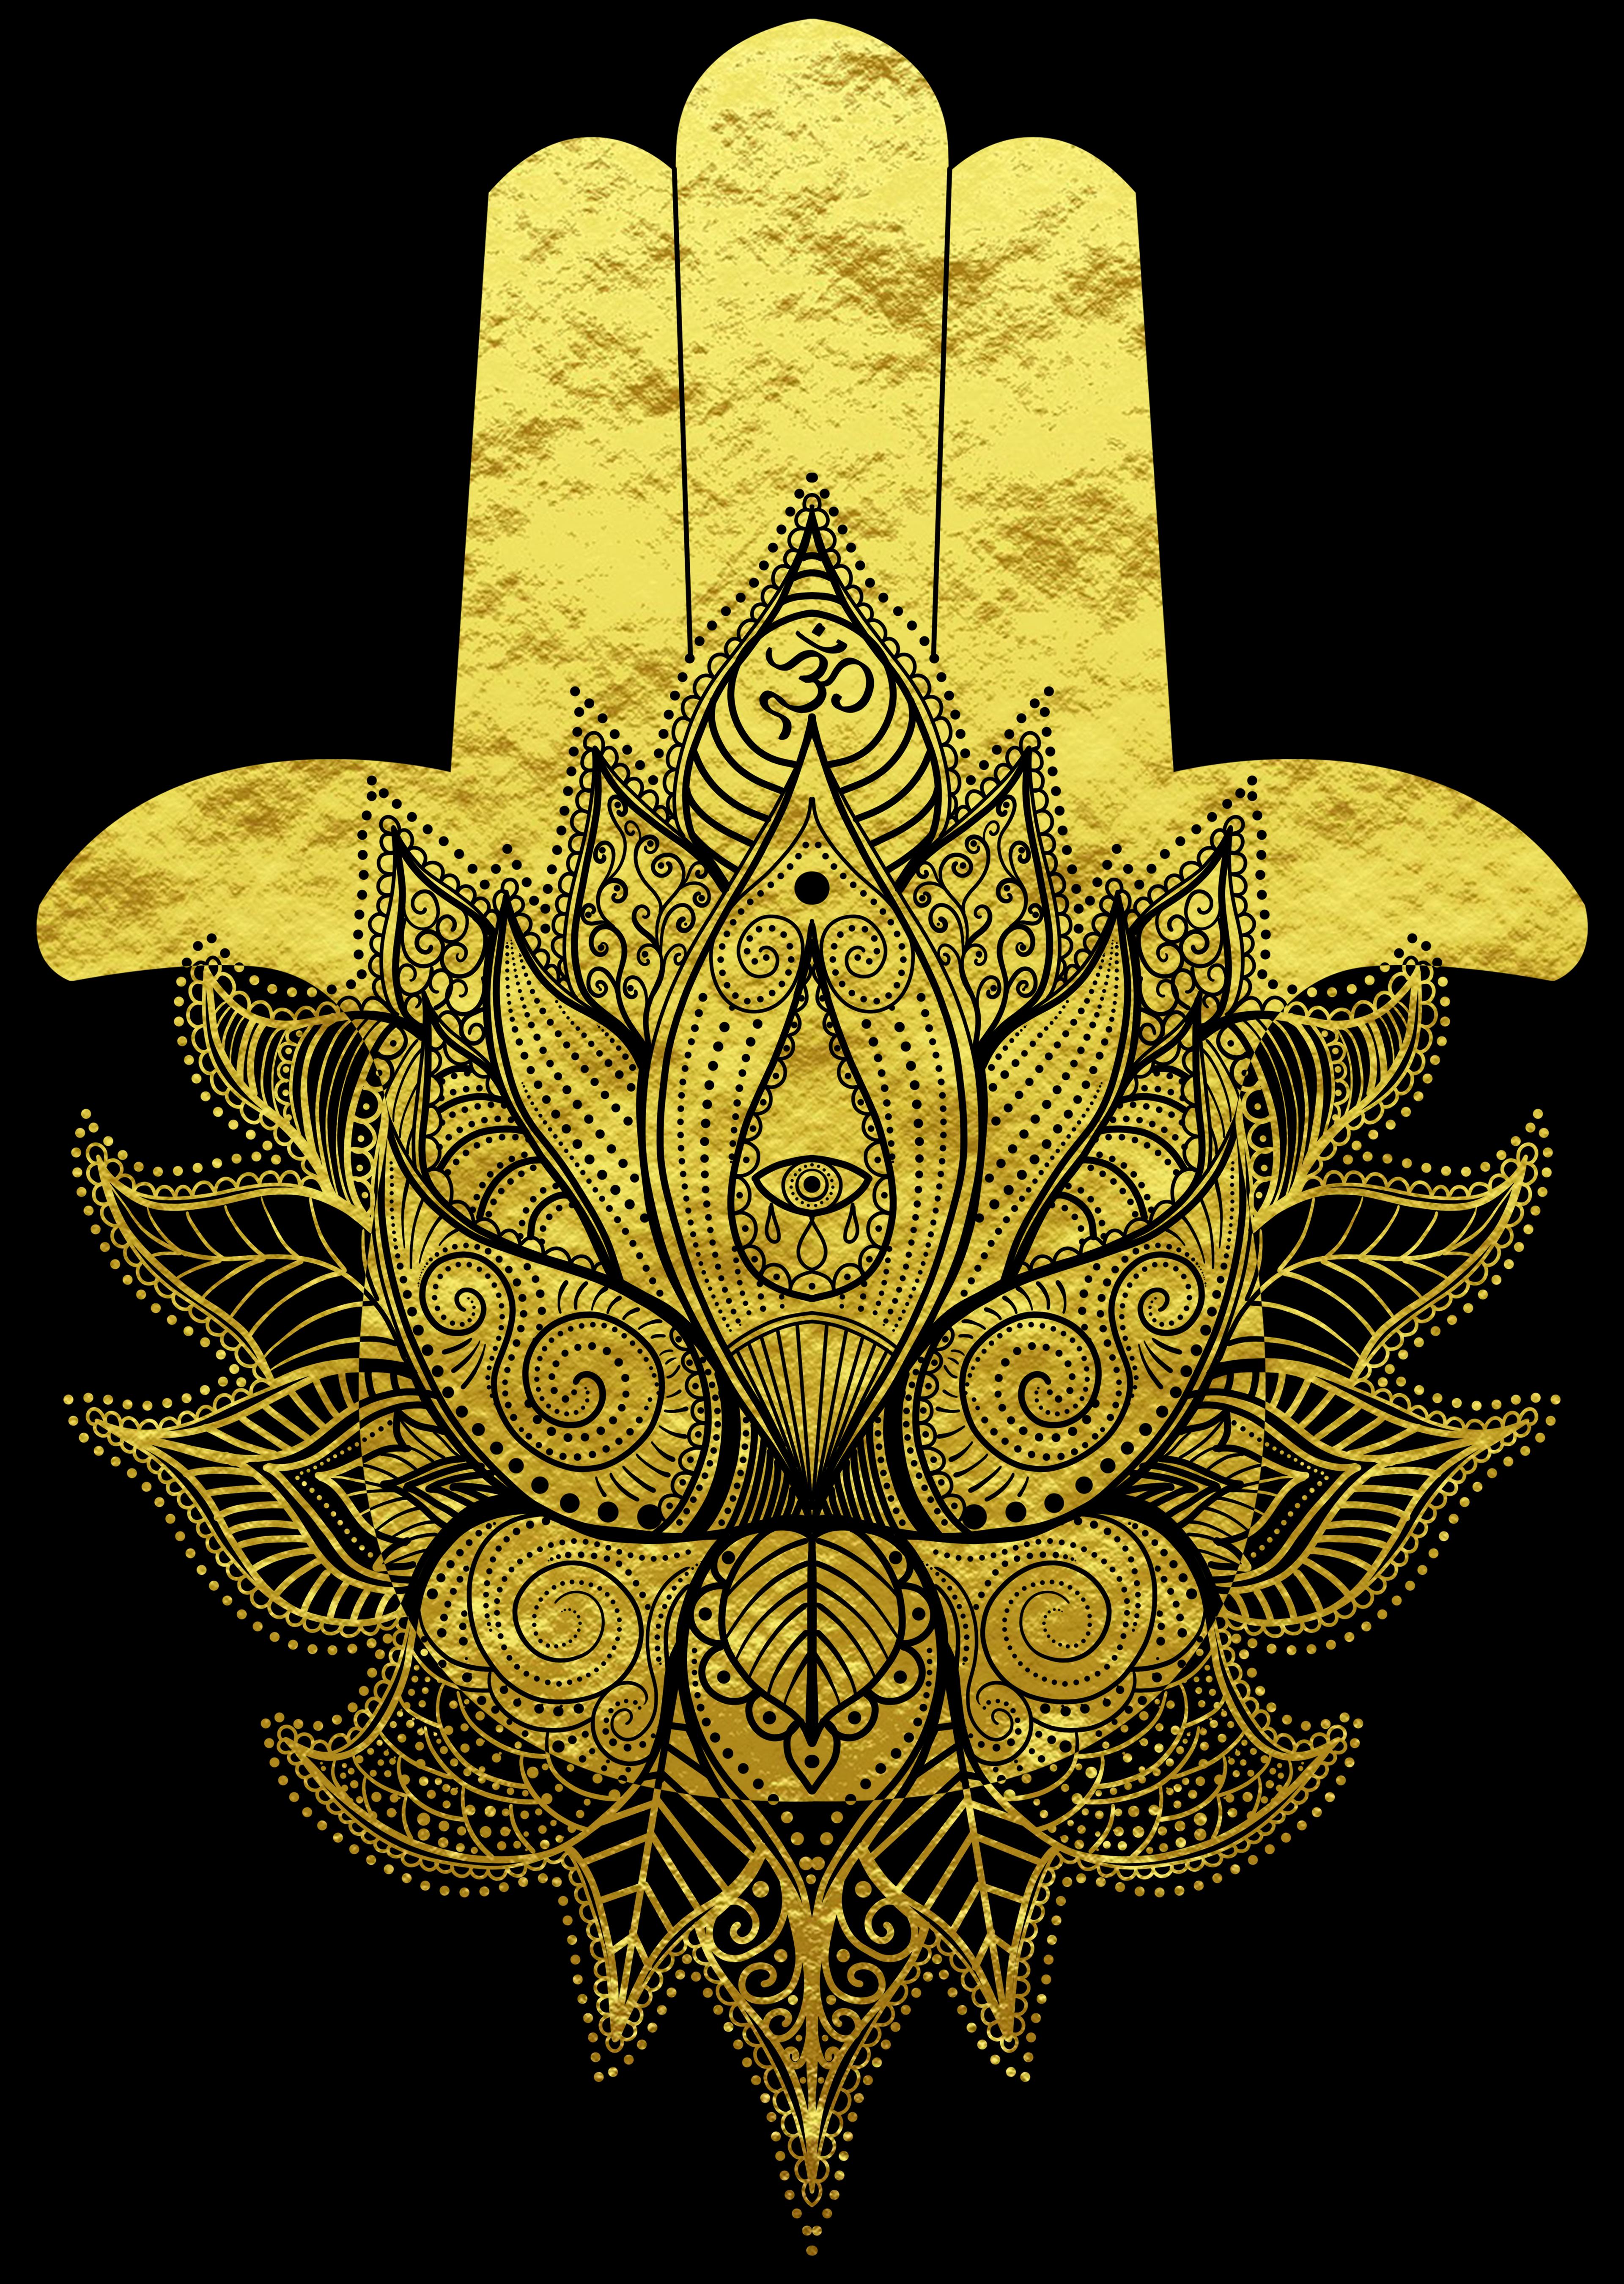 Hamsa Hand Flower Of Life Mandala Om Symbol Blume Des Lebens Tattoo Hamsa Mandala T Shirt